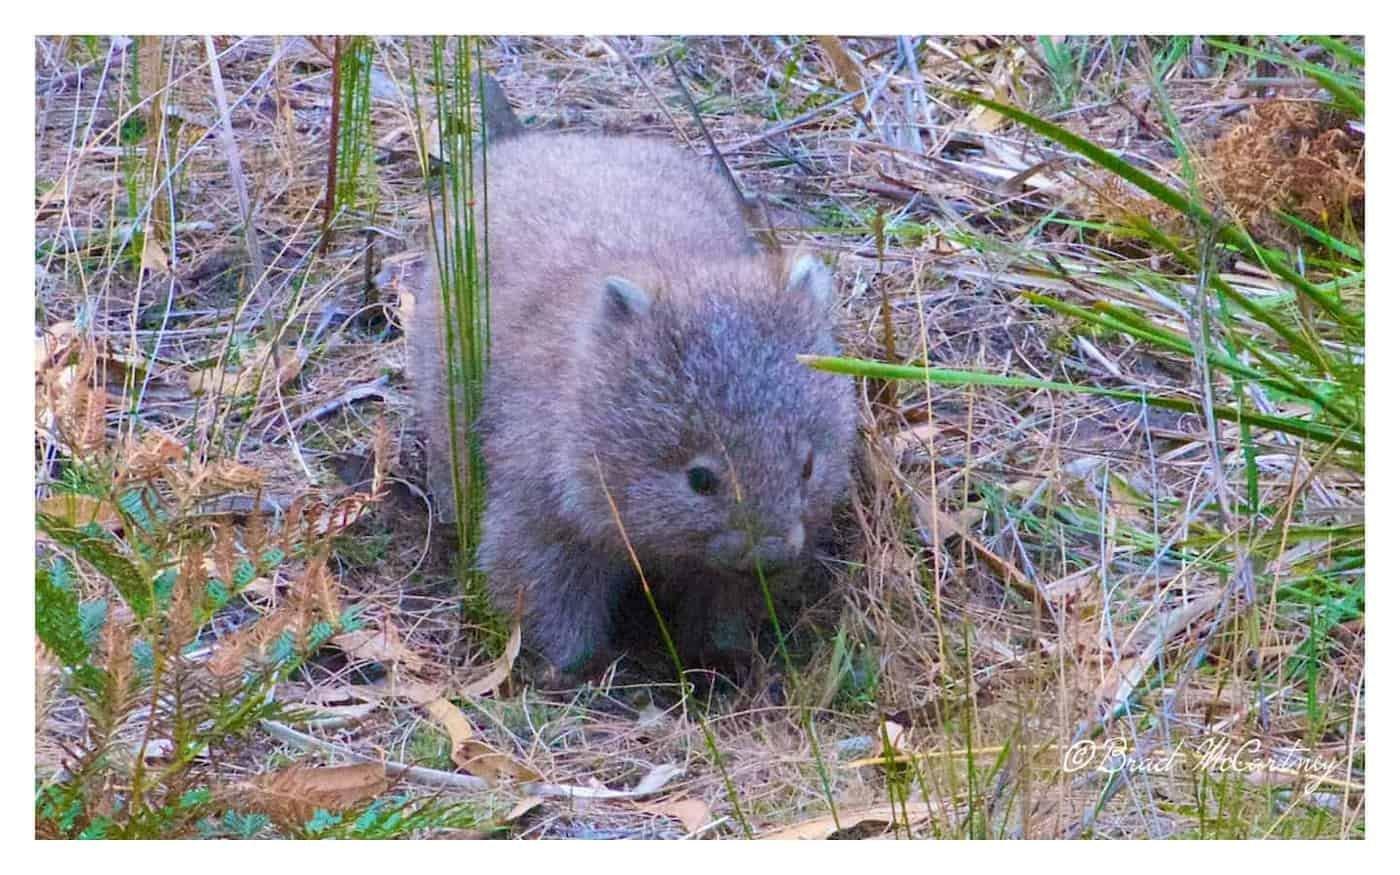 Wombat near Encampment